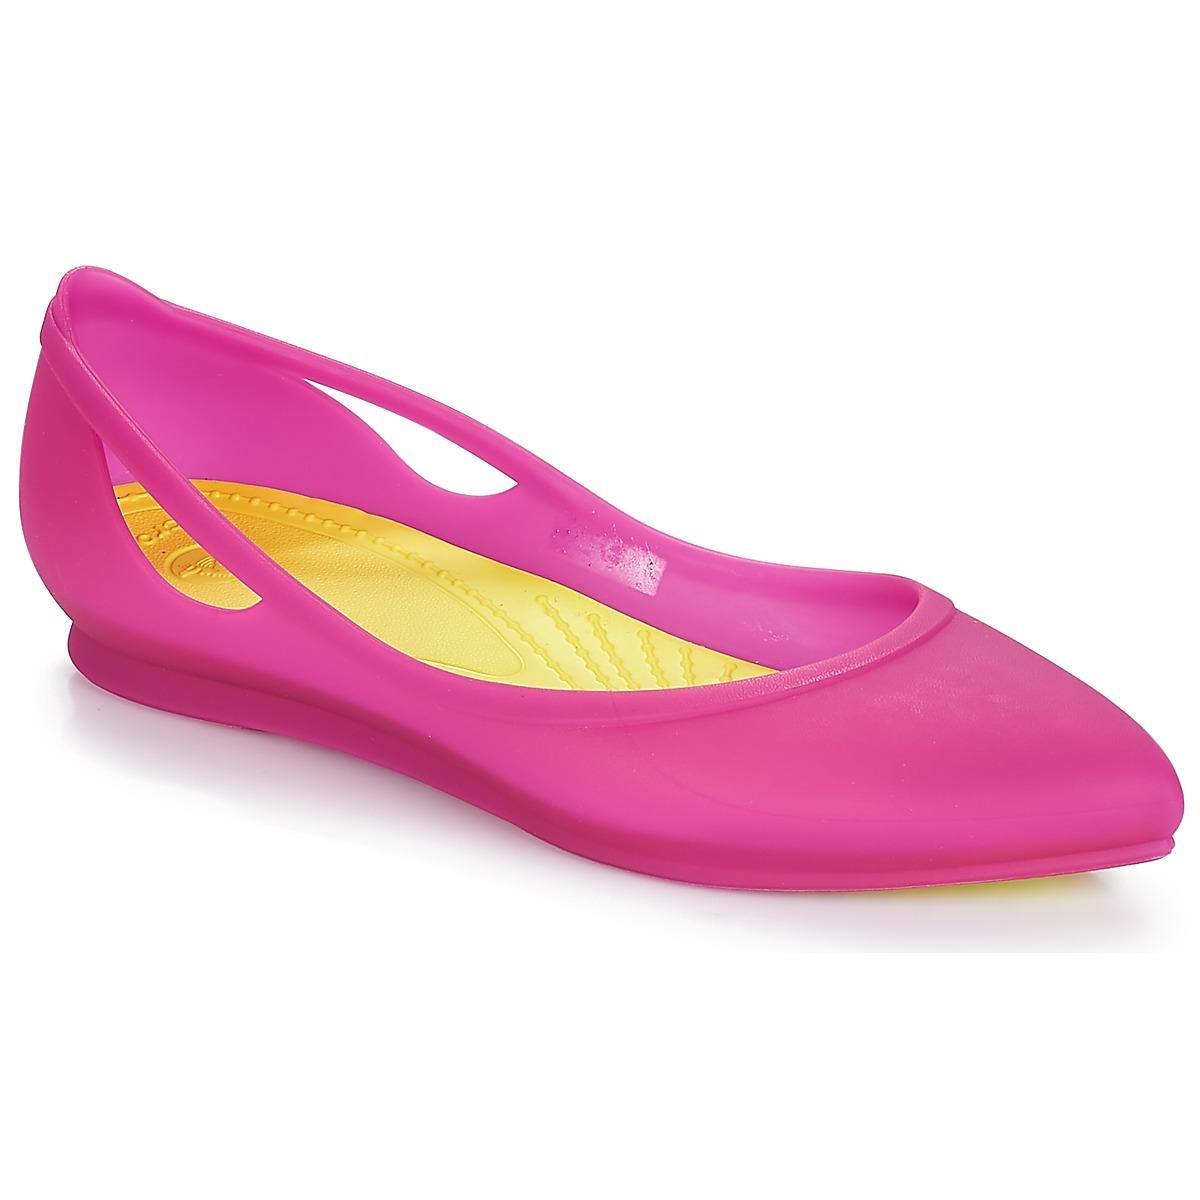 Ballerine donna Crocs  CROCSRIOFLATW  Rosa Crocs 887350357509